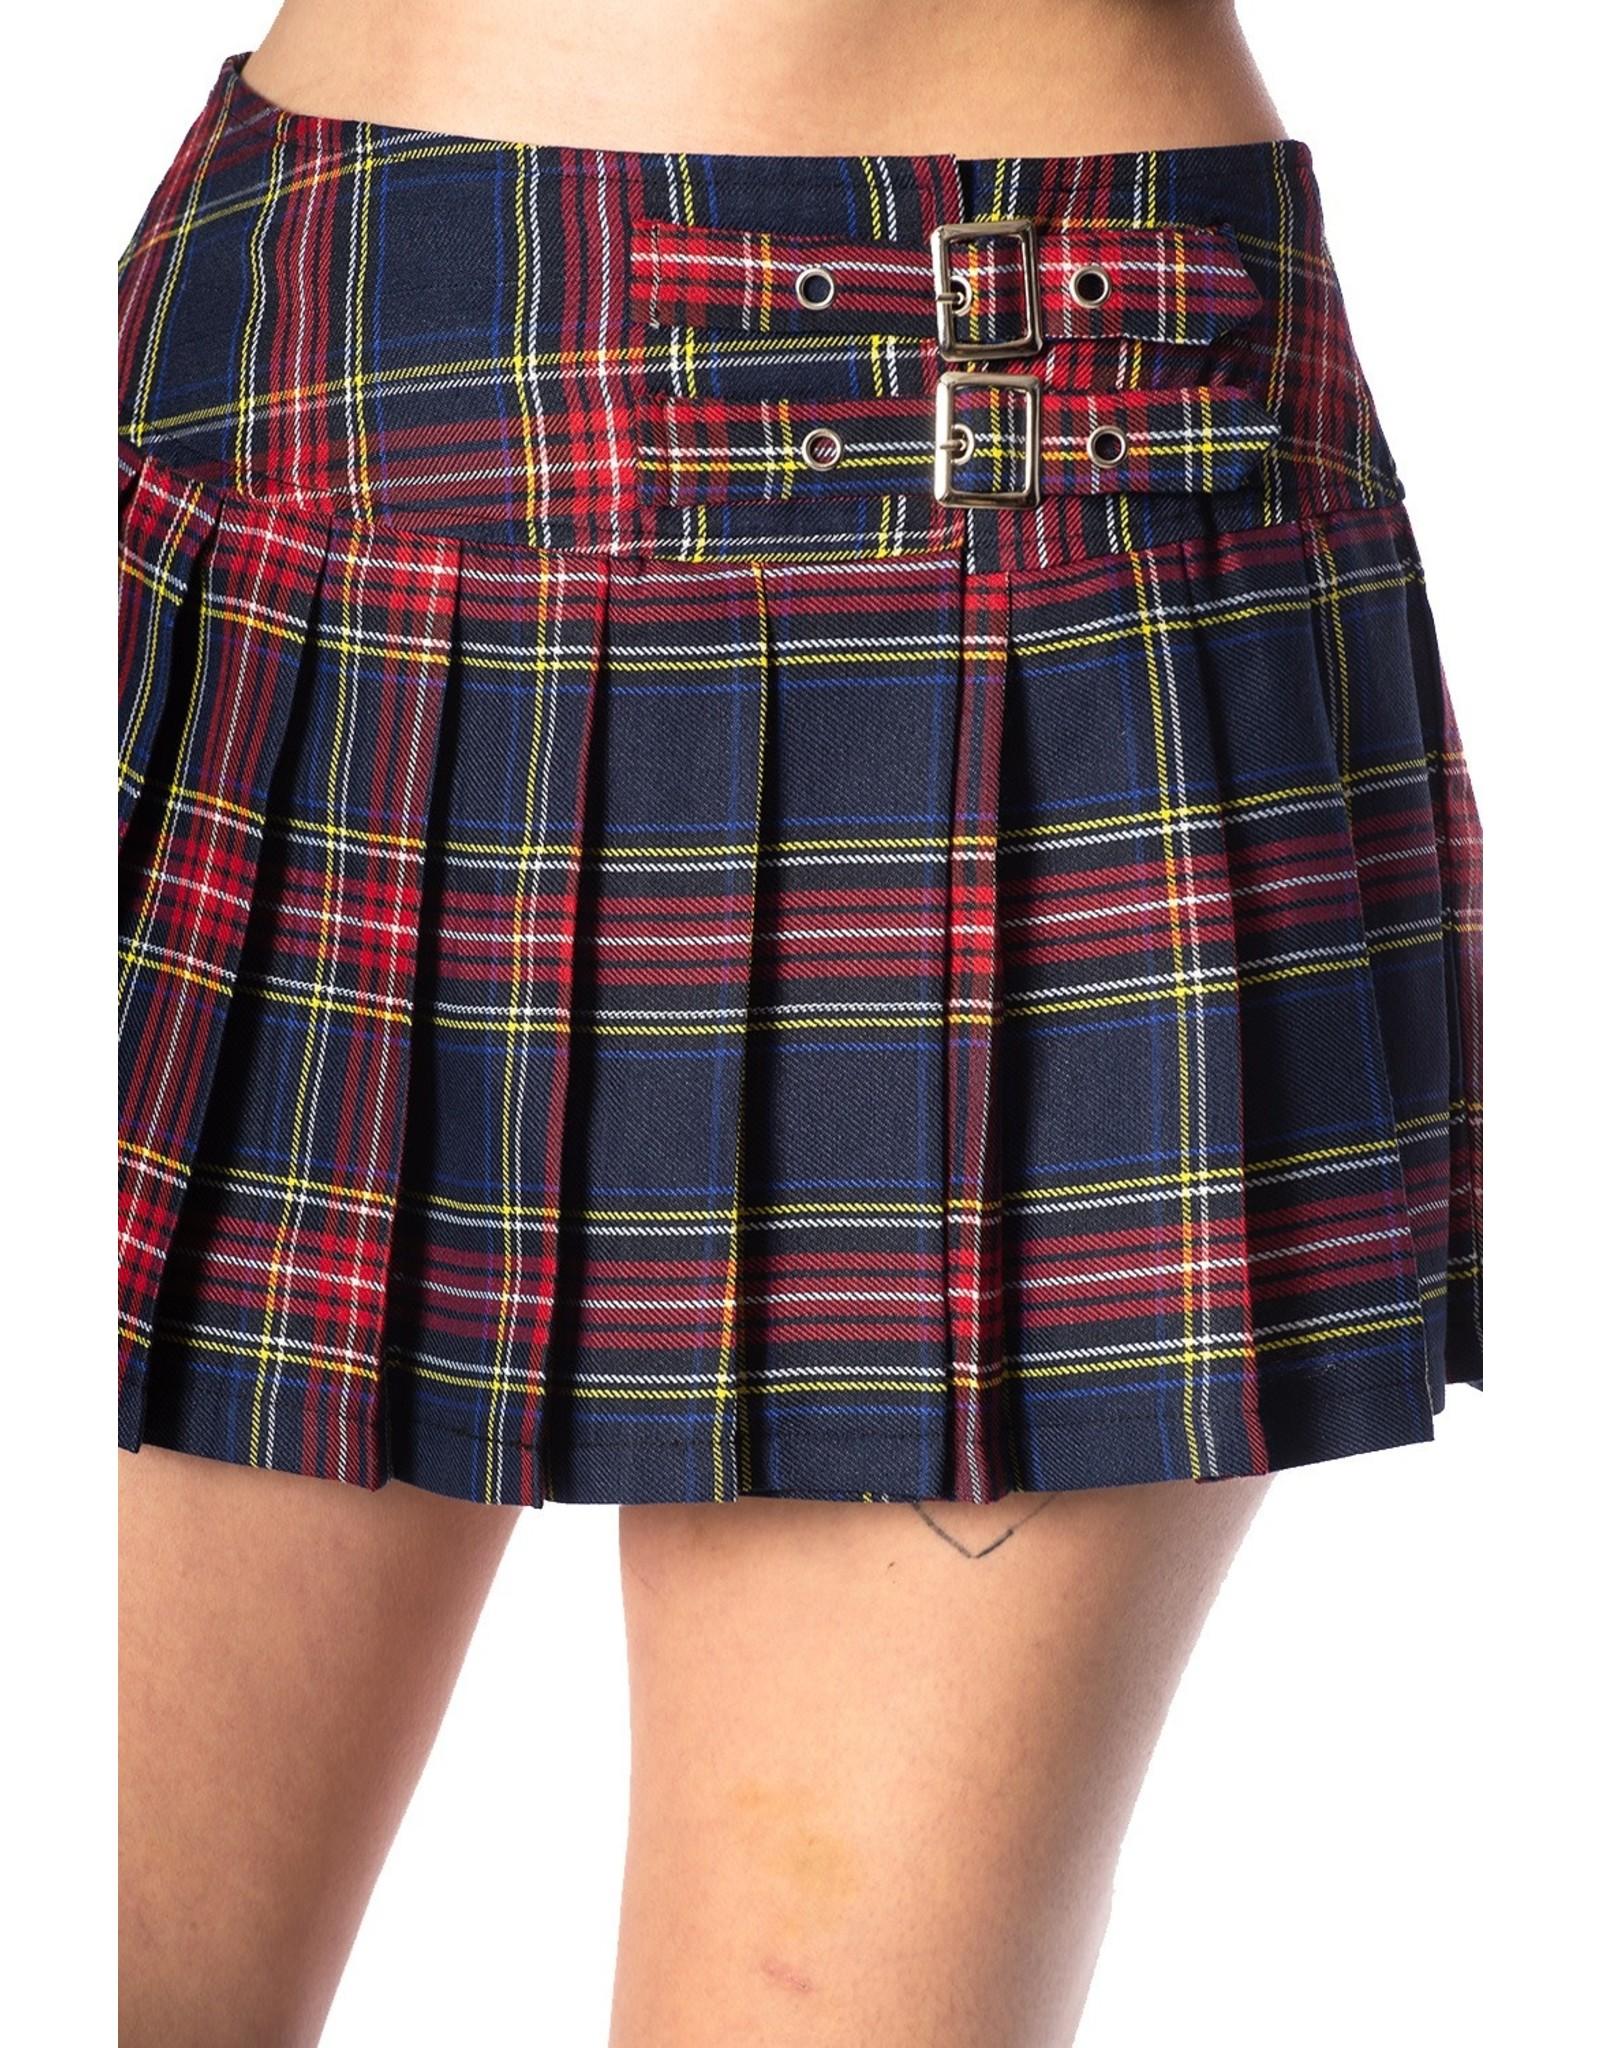 BANNED - Navy Checkered Mini Skirt